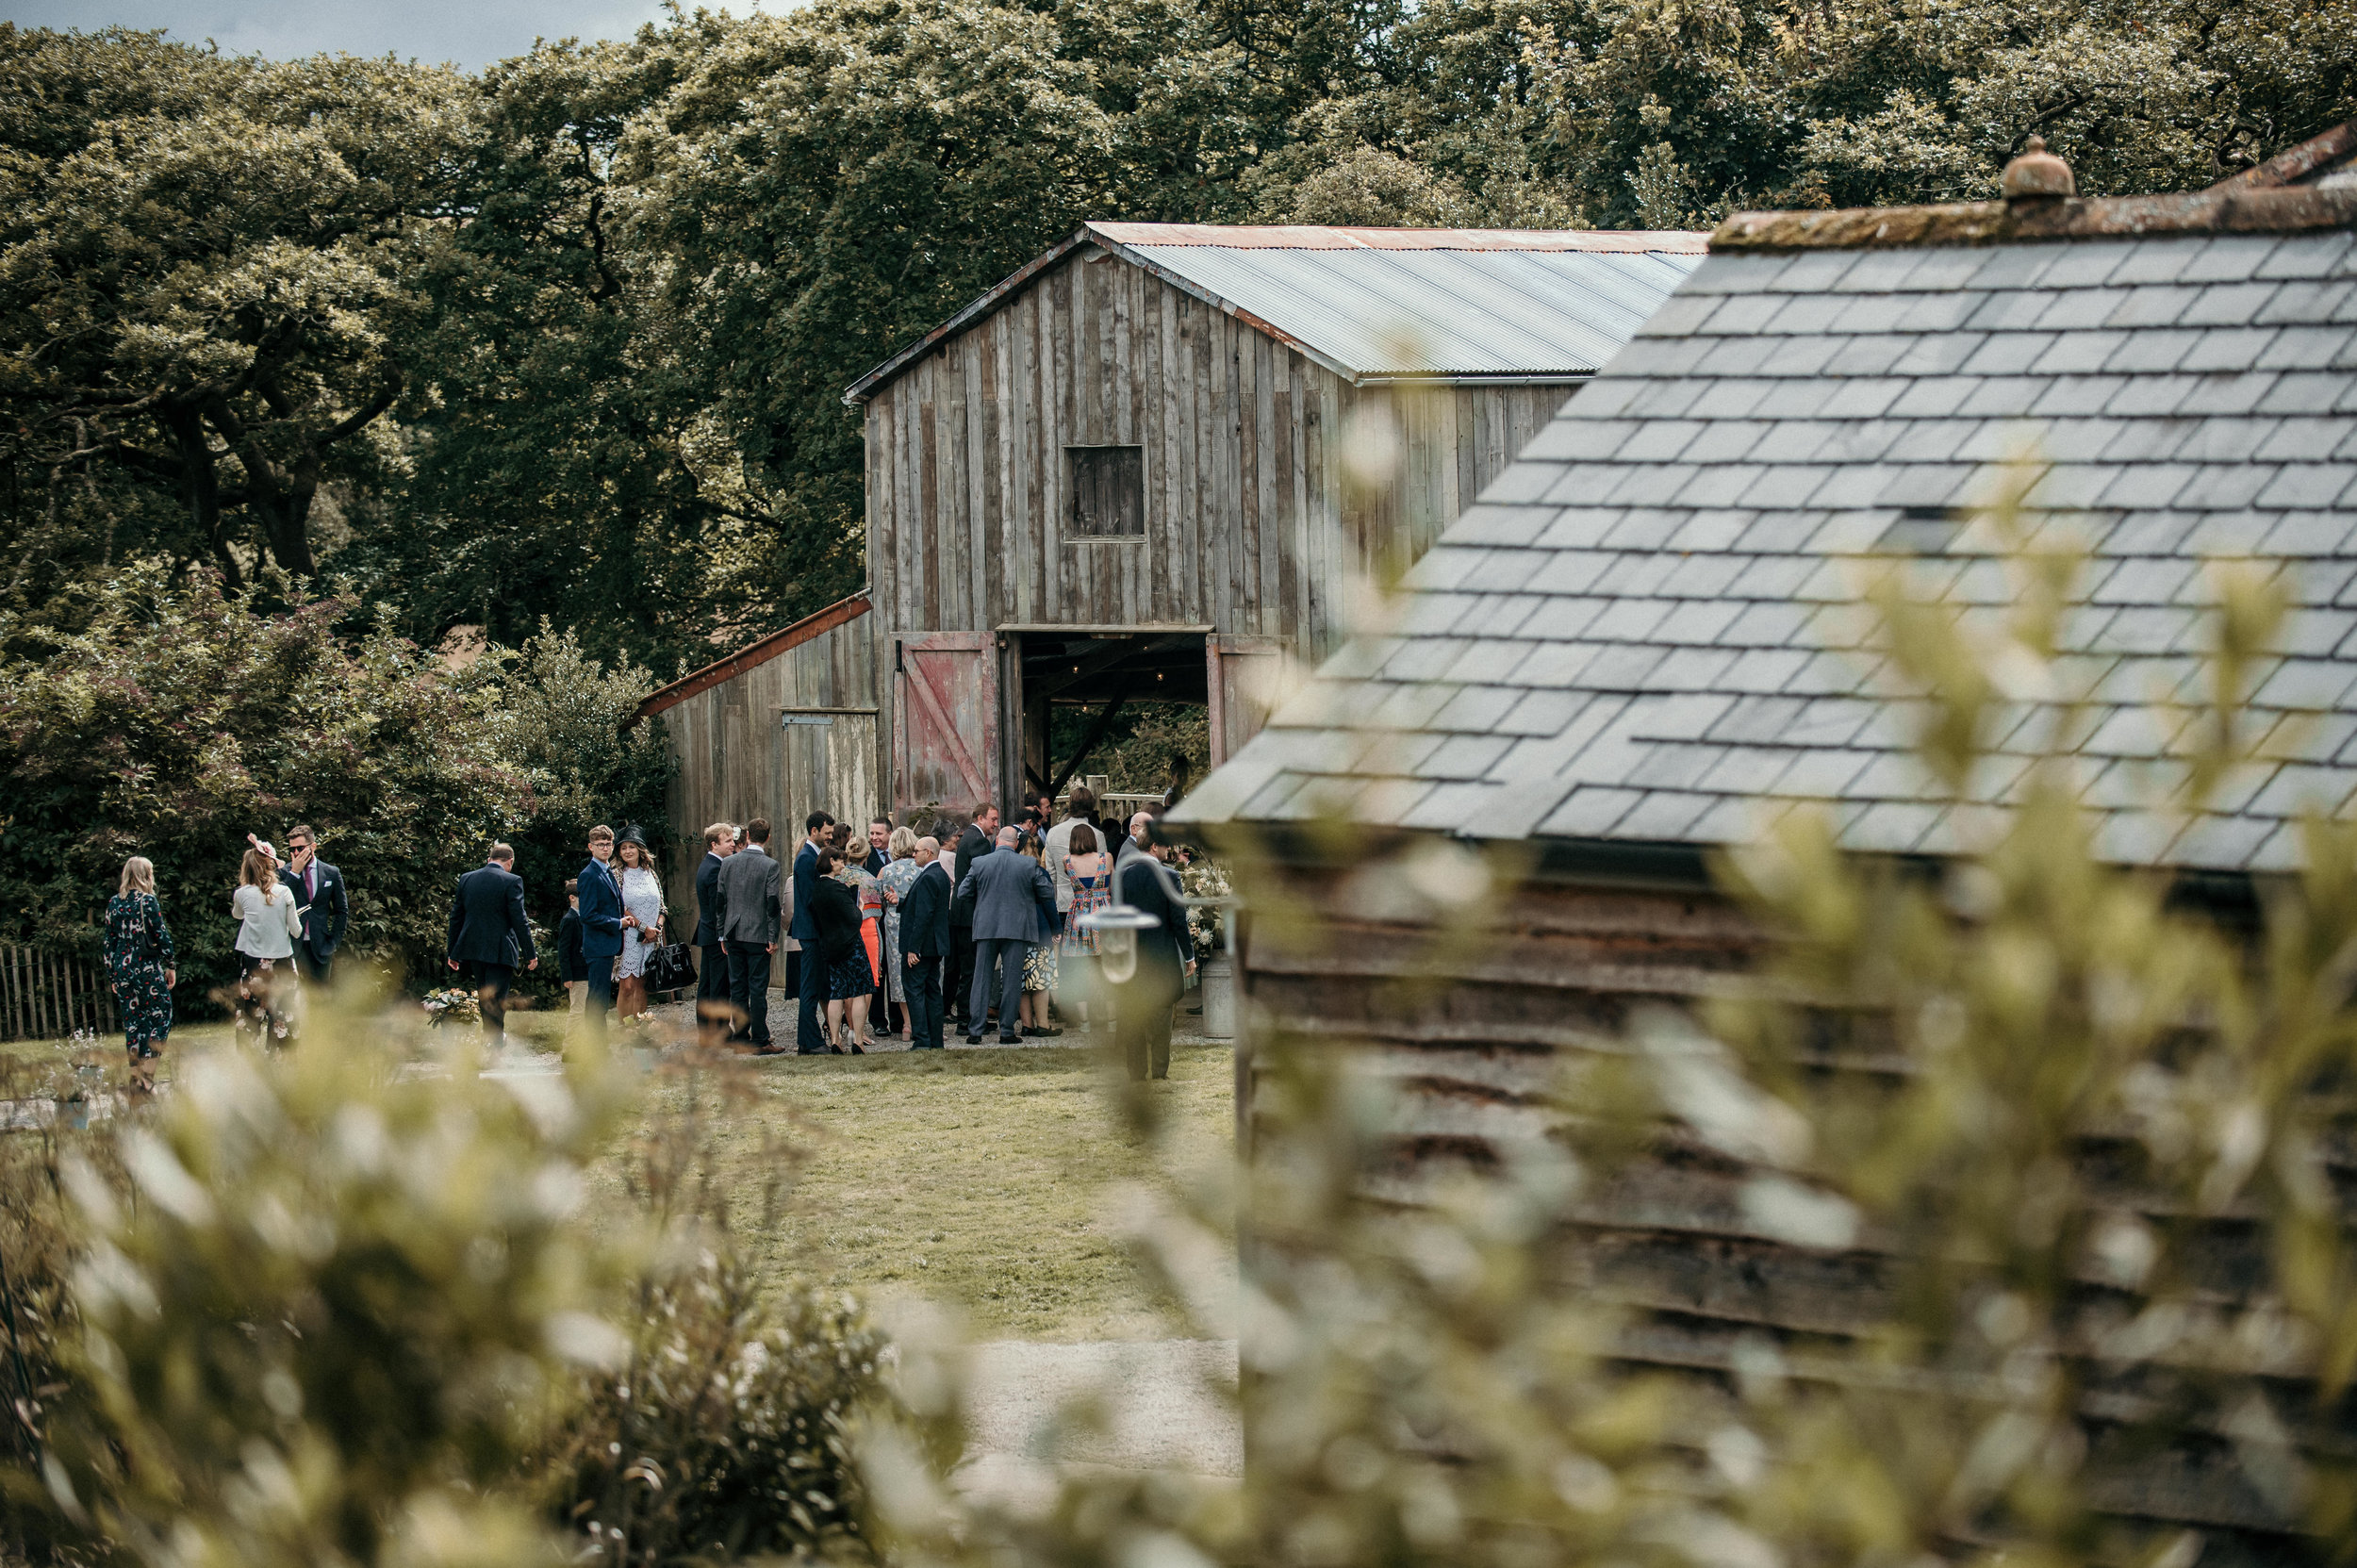 nancarrow-farm-wedding-photographer-cornwall-4.jpg